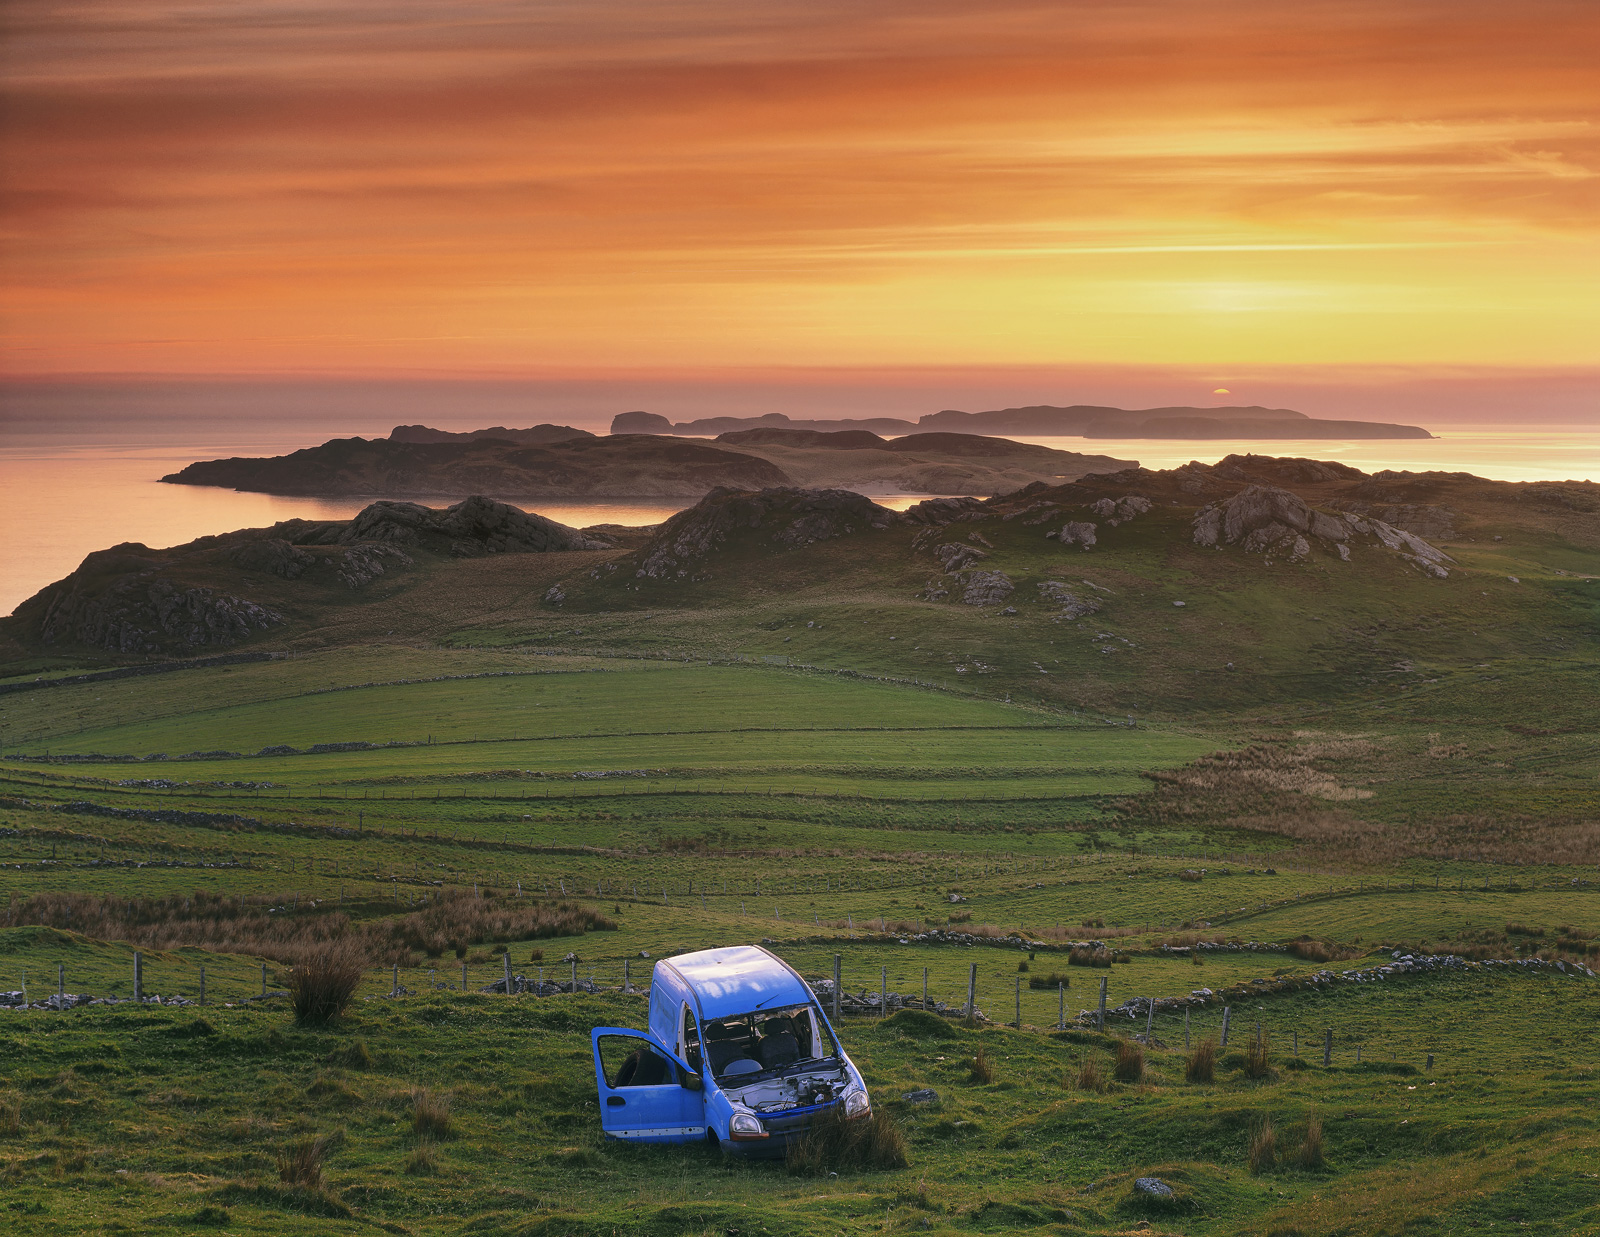 Exquisite Fly Tipping, Talmine, Sutherland, Scotland, stunning, view, blue, van, pasture, Rabbit island, beauty, charm , photo